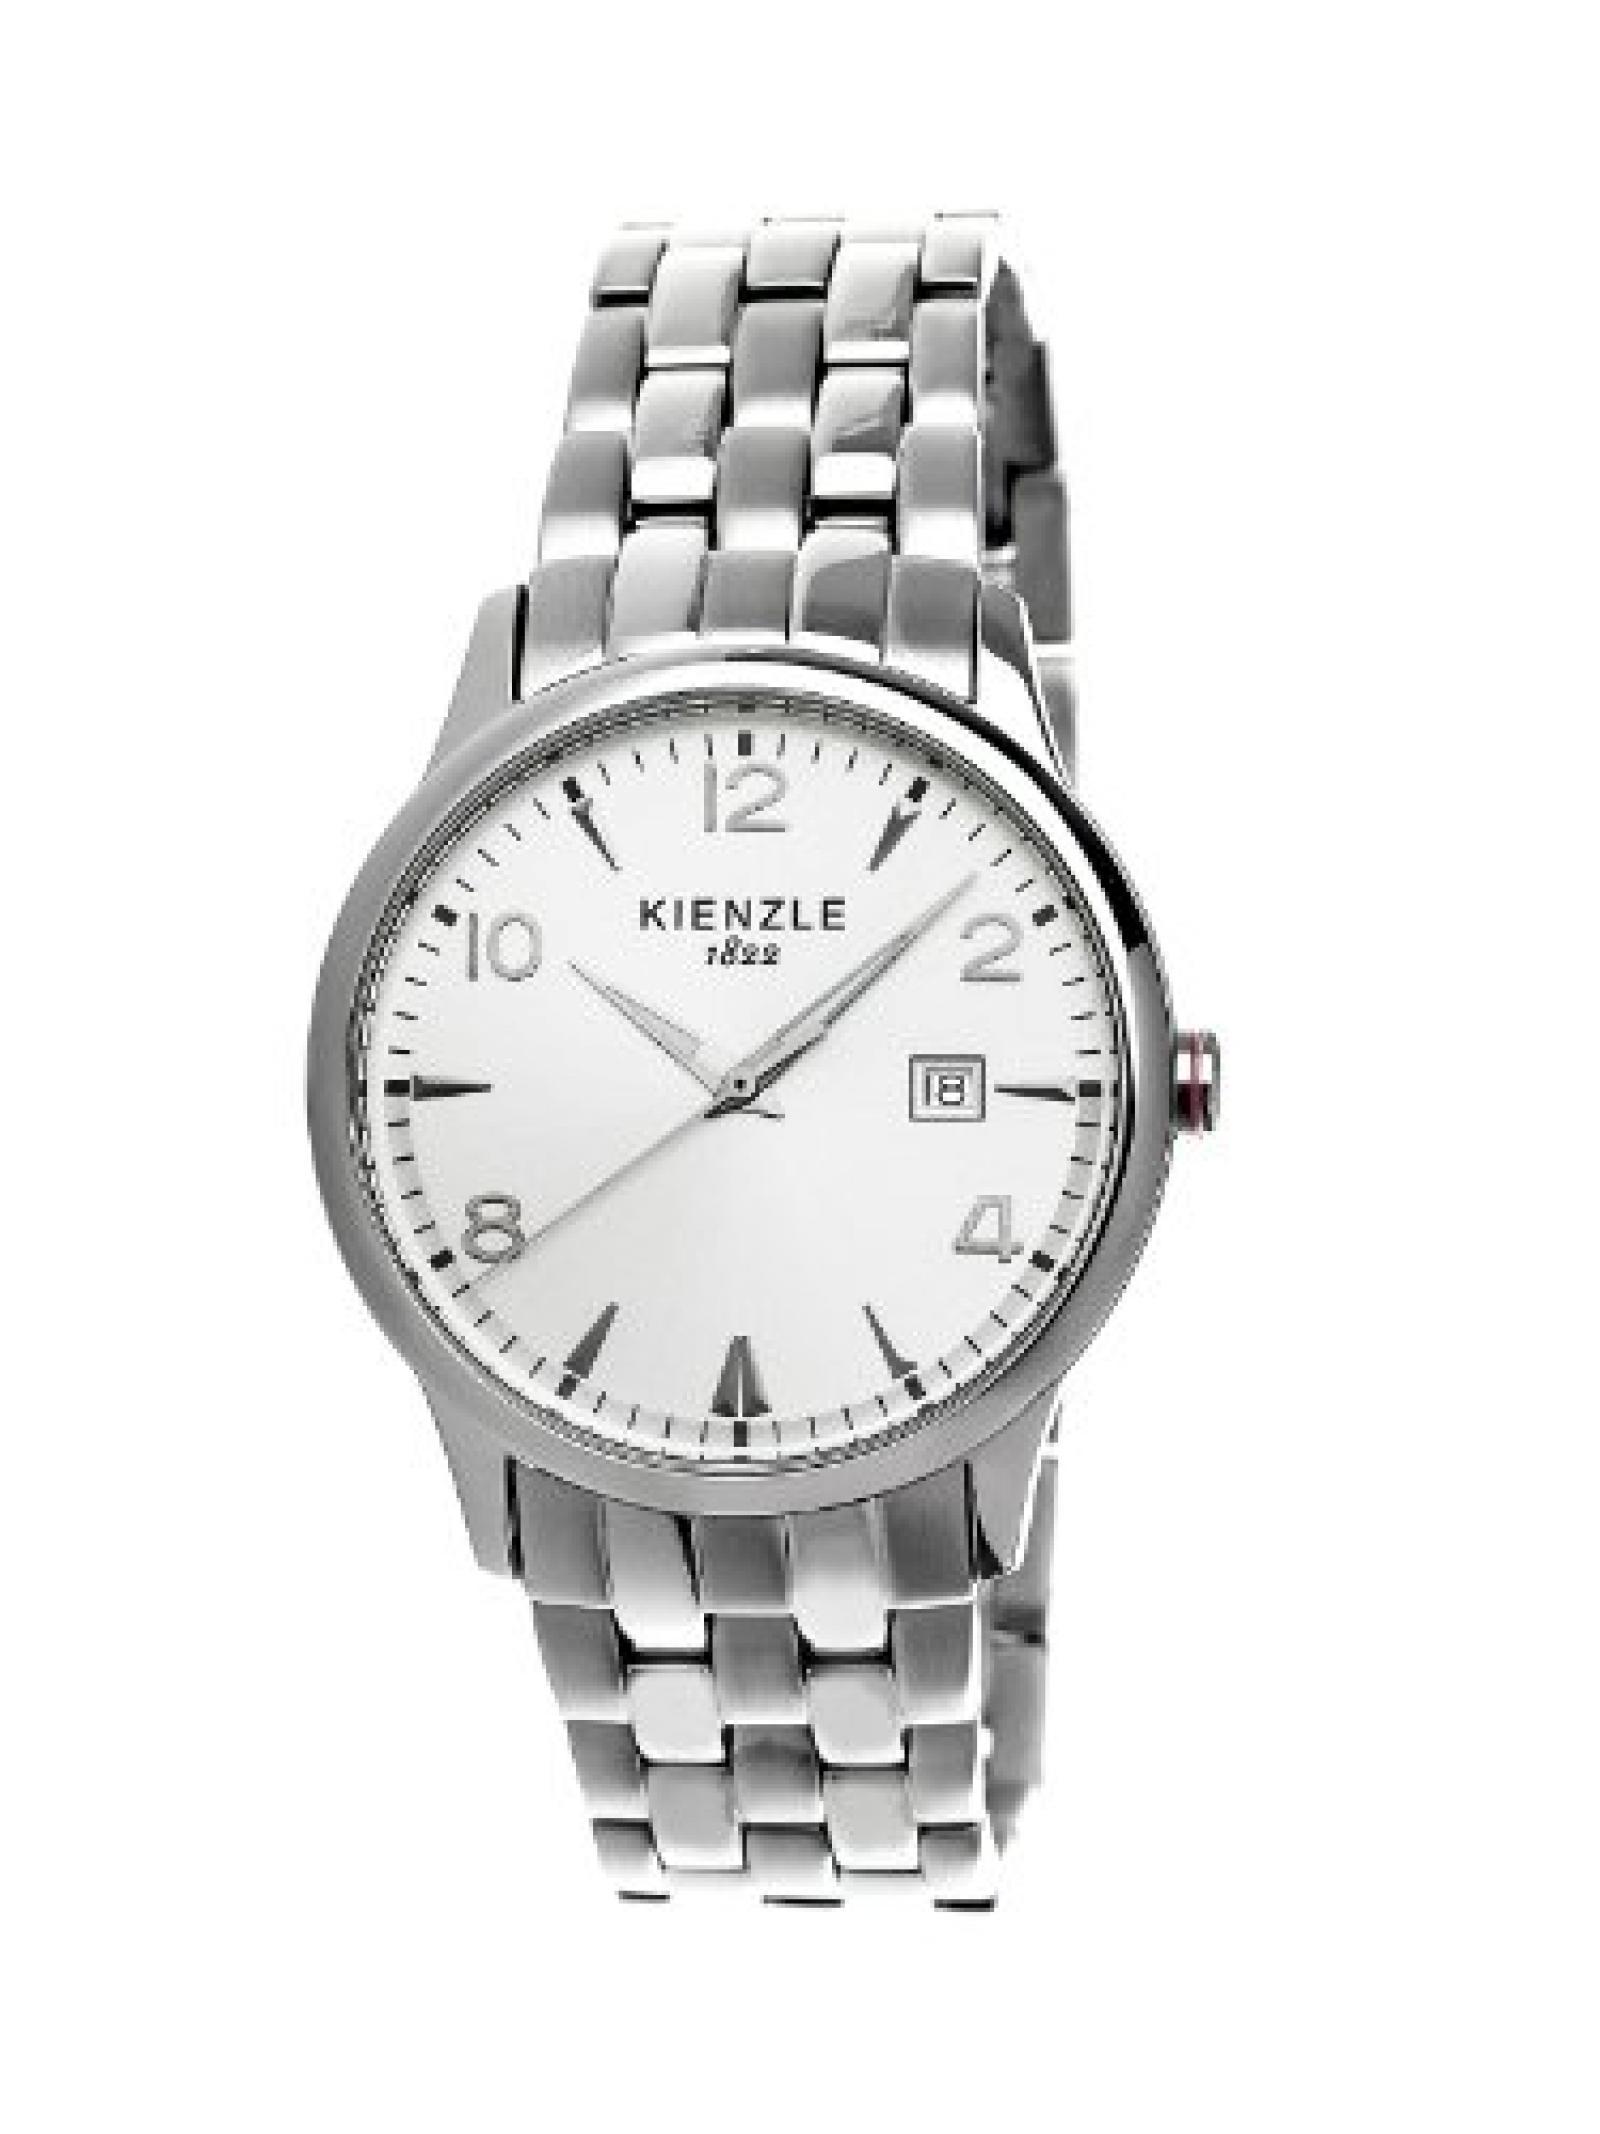 Kienzle Damen-Armbanduhr XS KIENZLE CORE Analog Quarz Edelstahlarmband K3042011202-00365